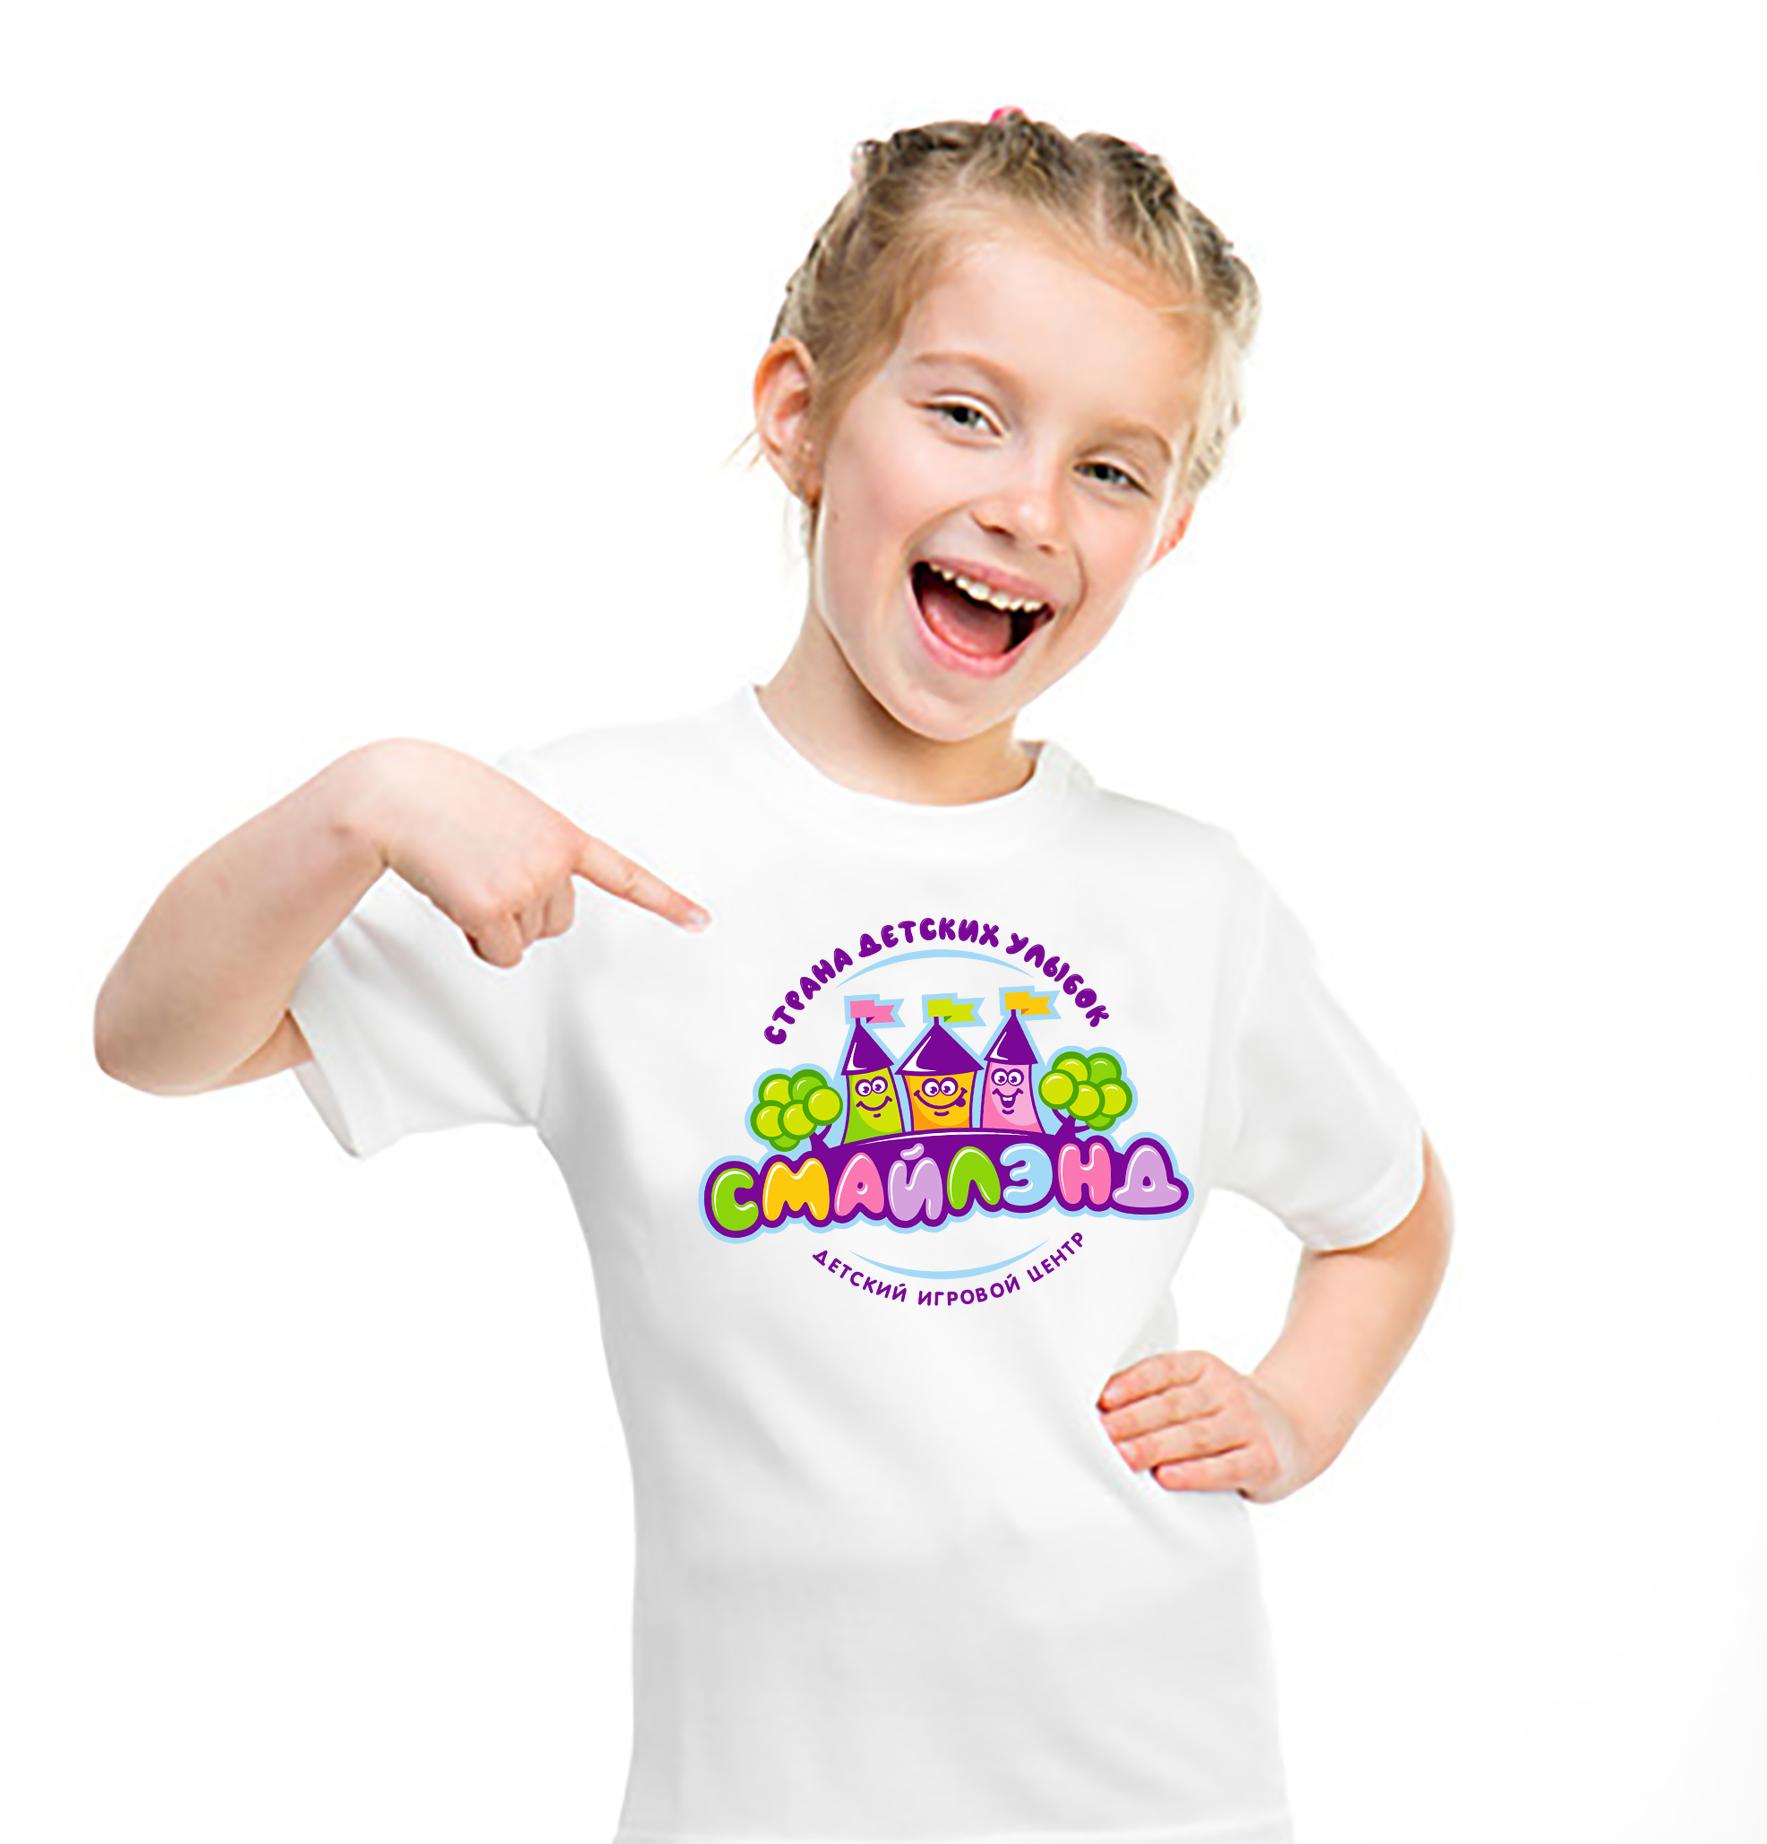 Логотип, стиль для детского игрового центра. фото f_0635a3f5e1ca18b3.jpg